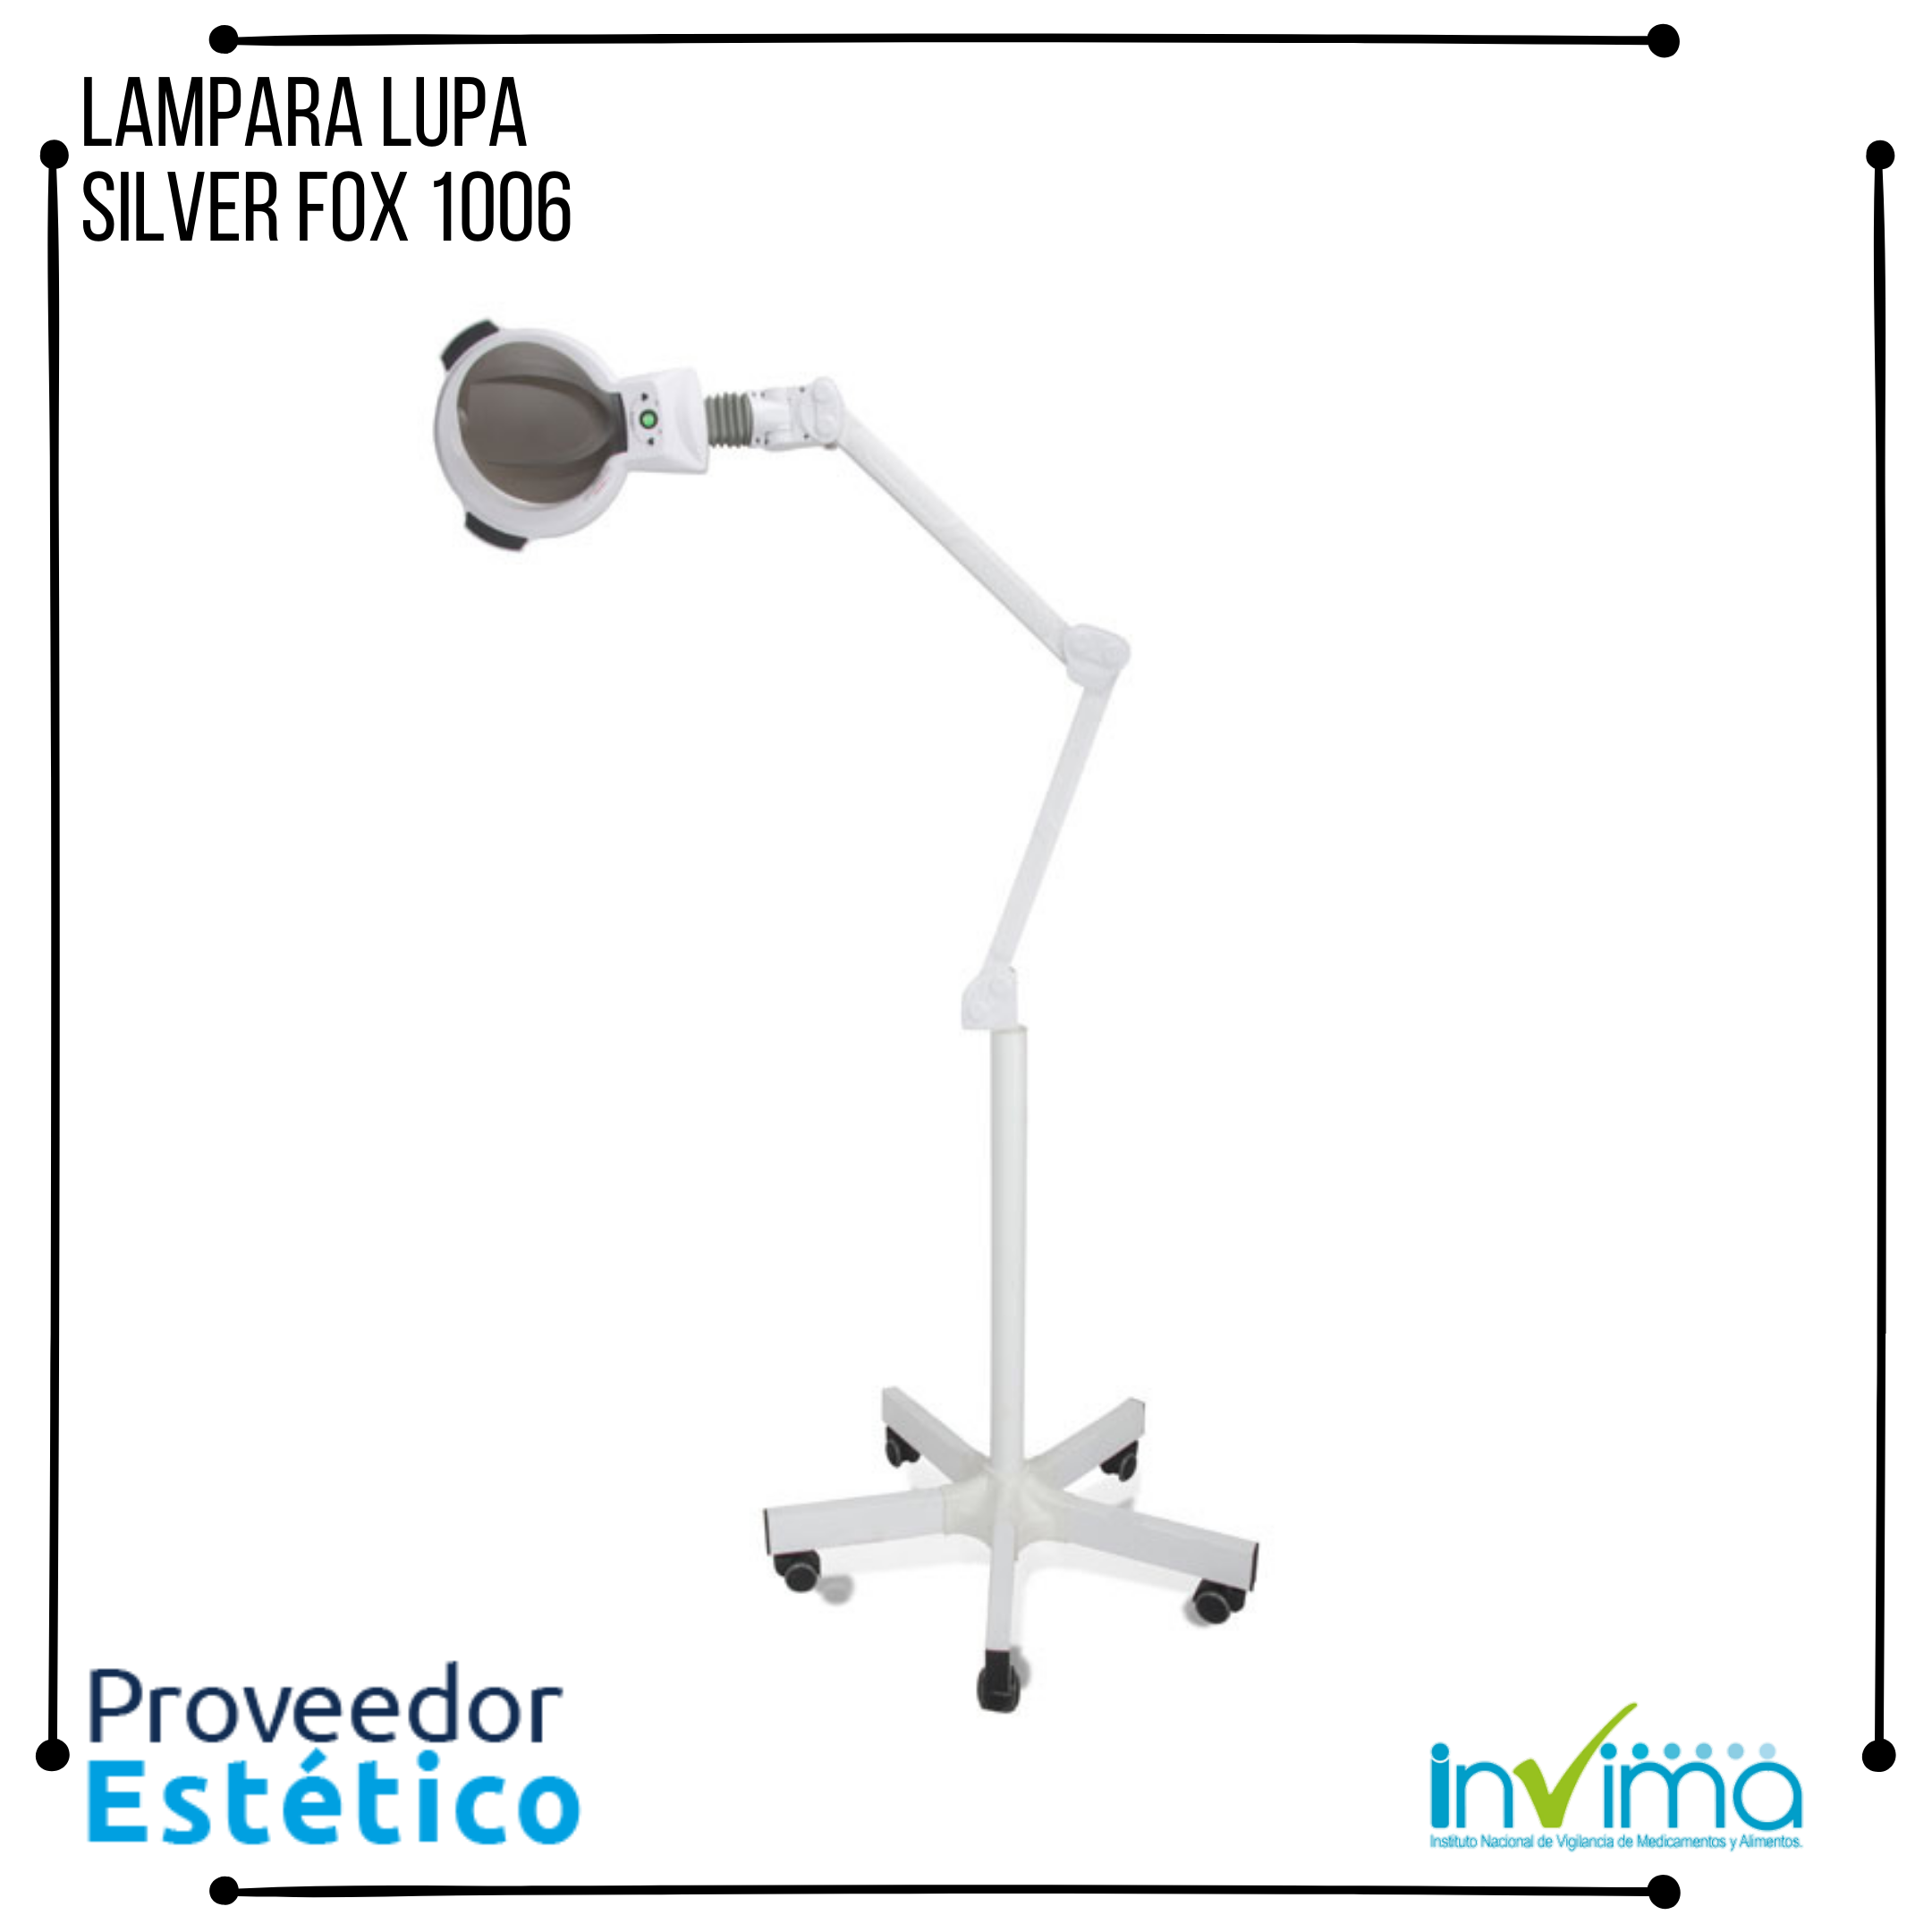 https://0201.nccdn.net/4_2/000/000/072/2aa/lampara-lupa-silver-fox-1006.png